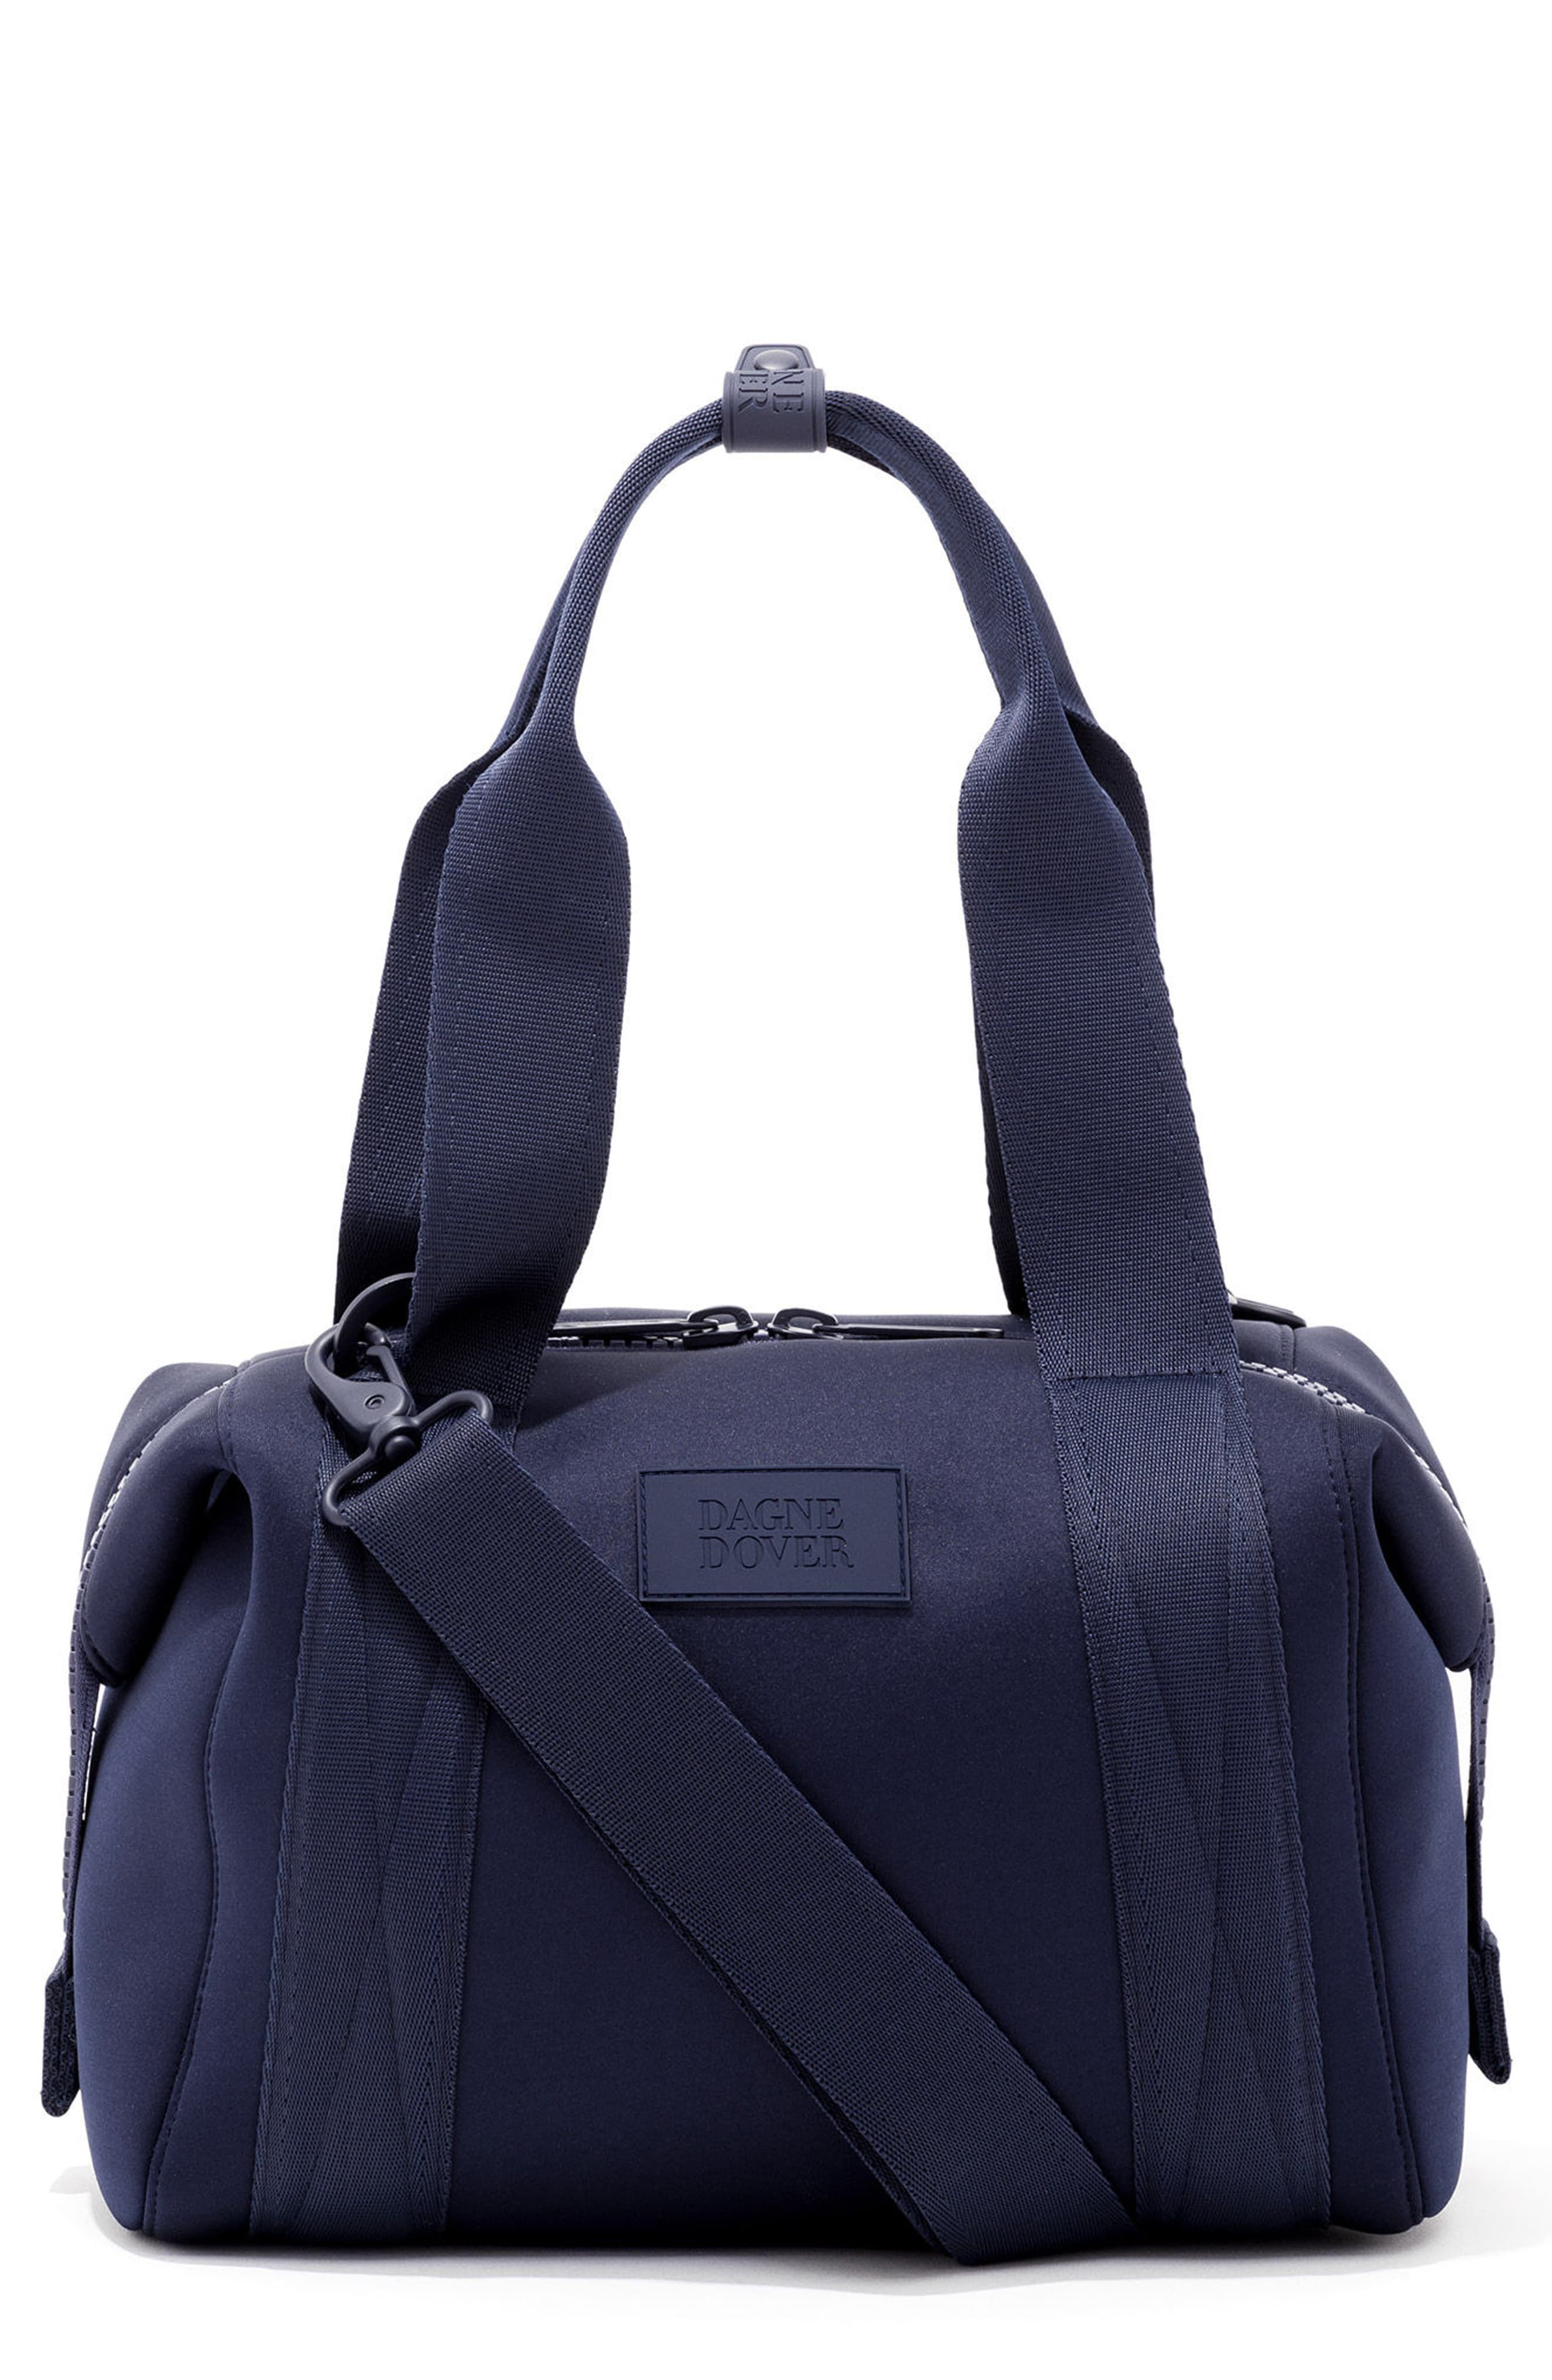 2729b899a49 365 Small Landon Carryall Duffle Bag